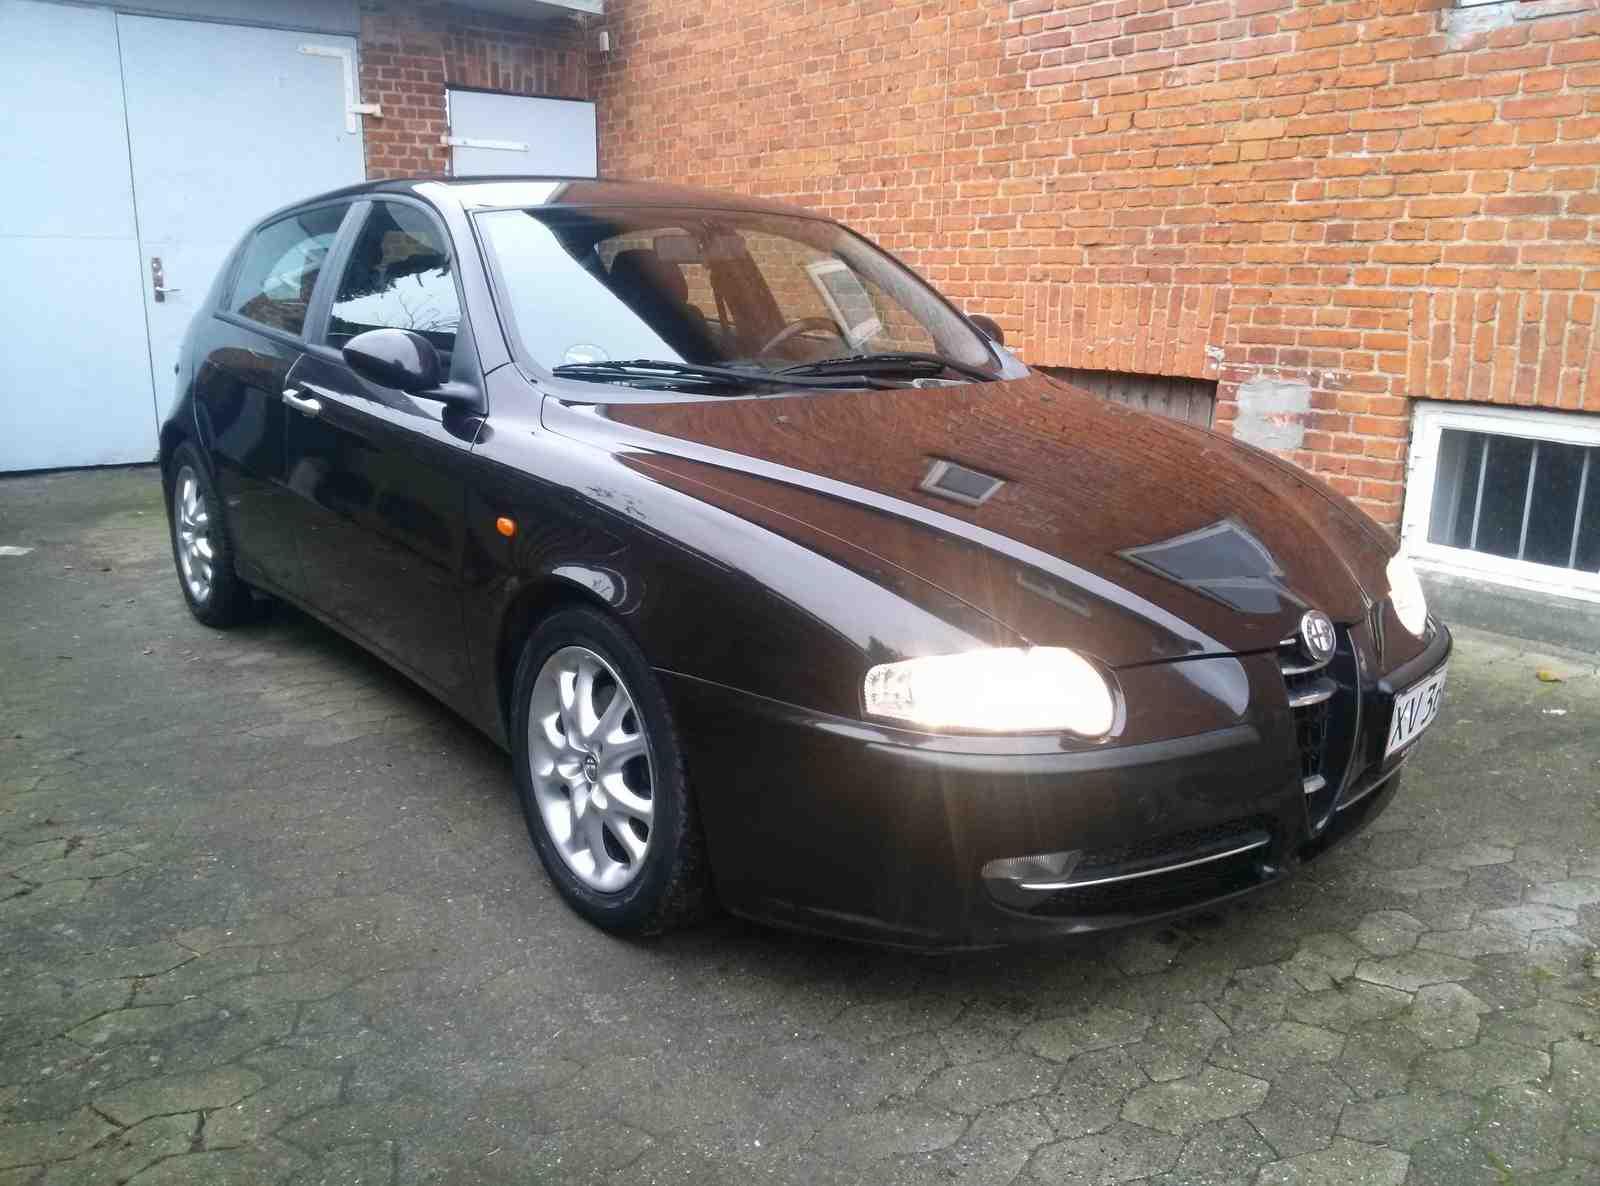 Alfa Romeo 147 2010 - Comprar ou Vender | KBB.pt